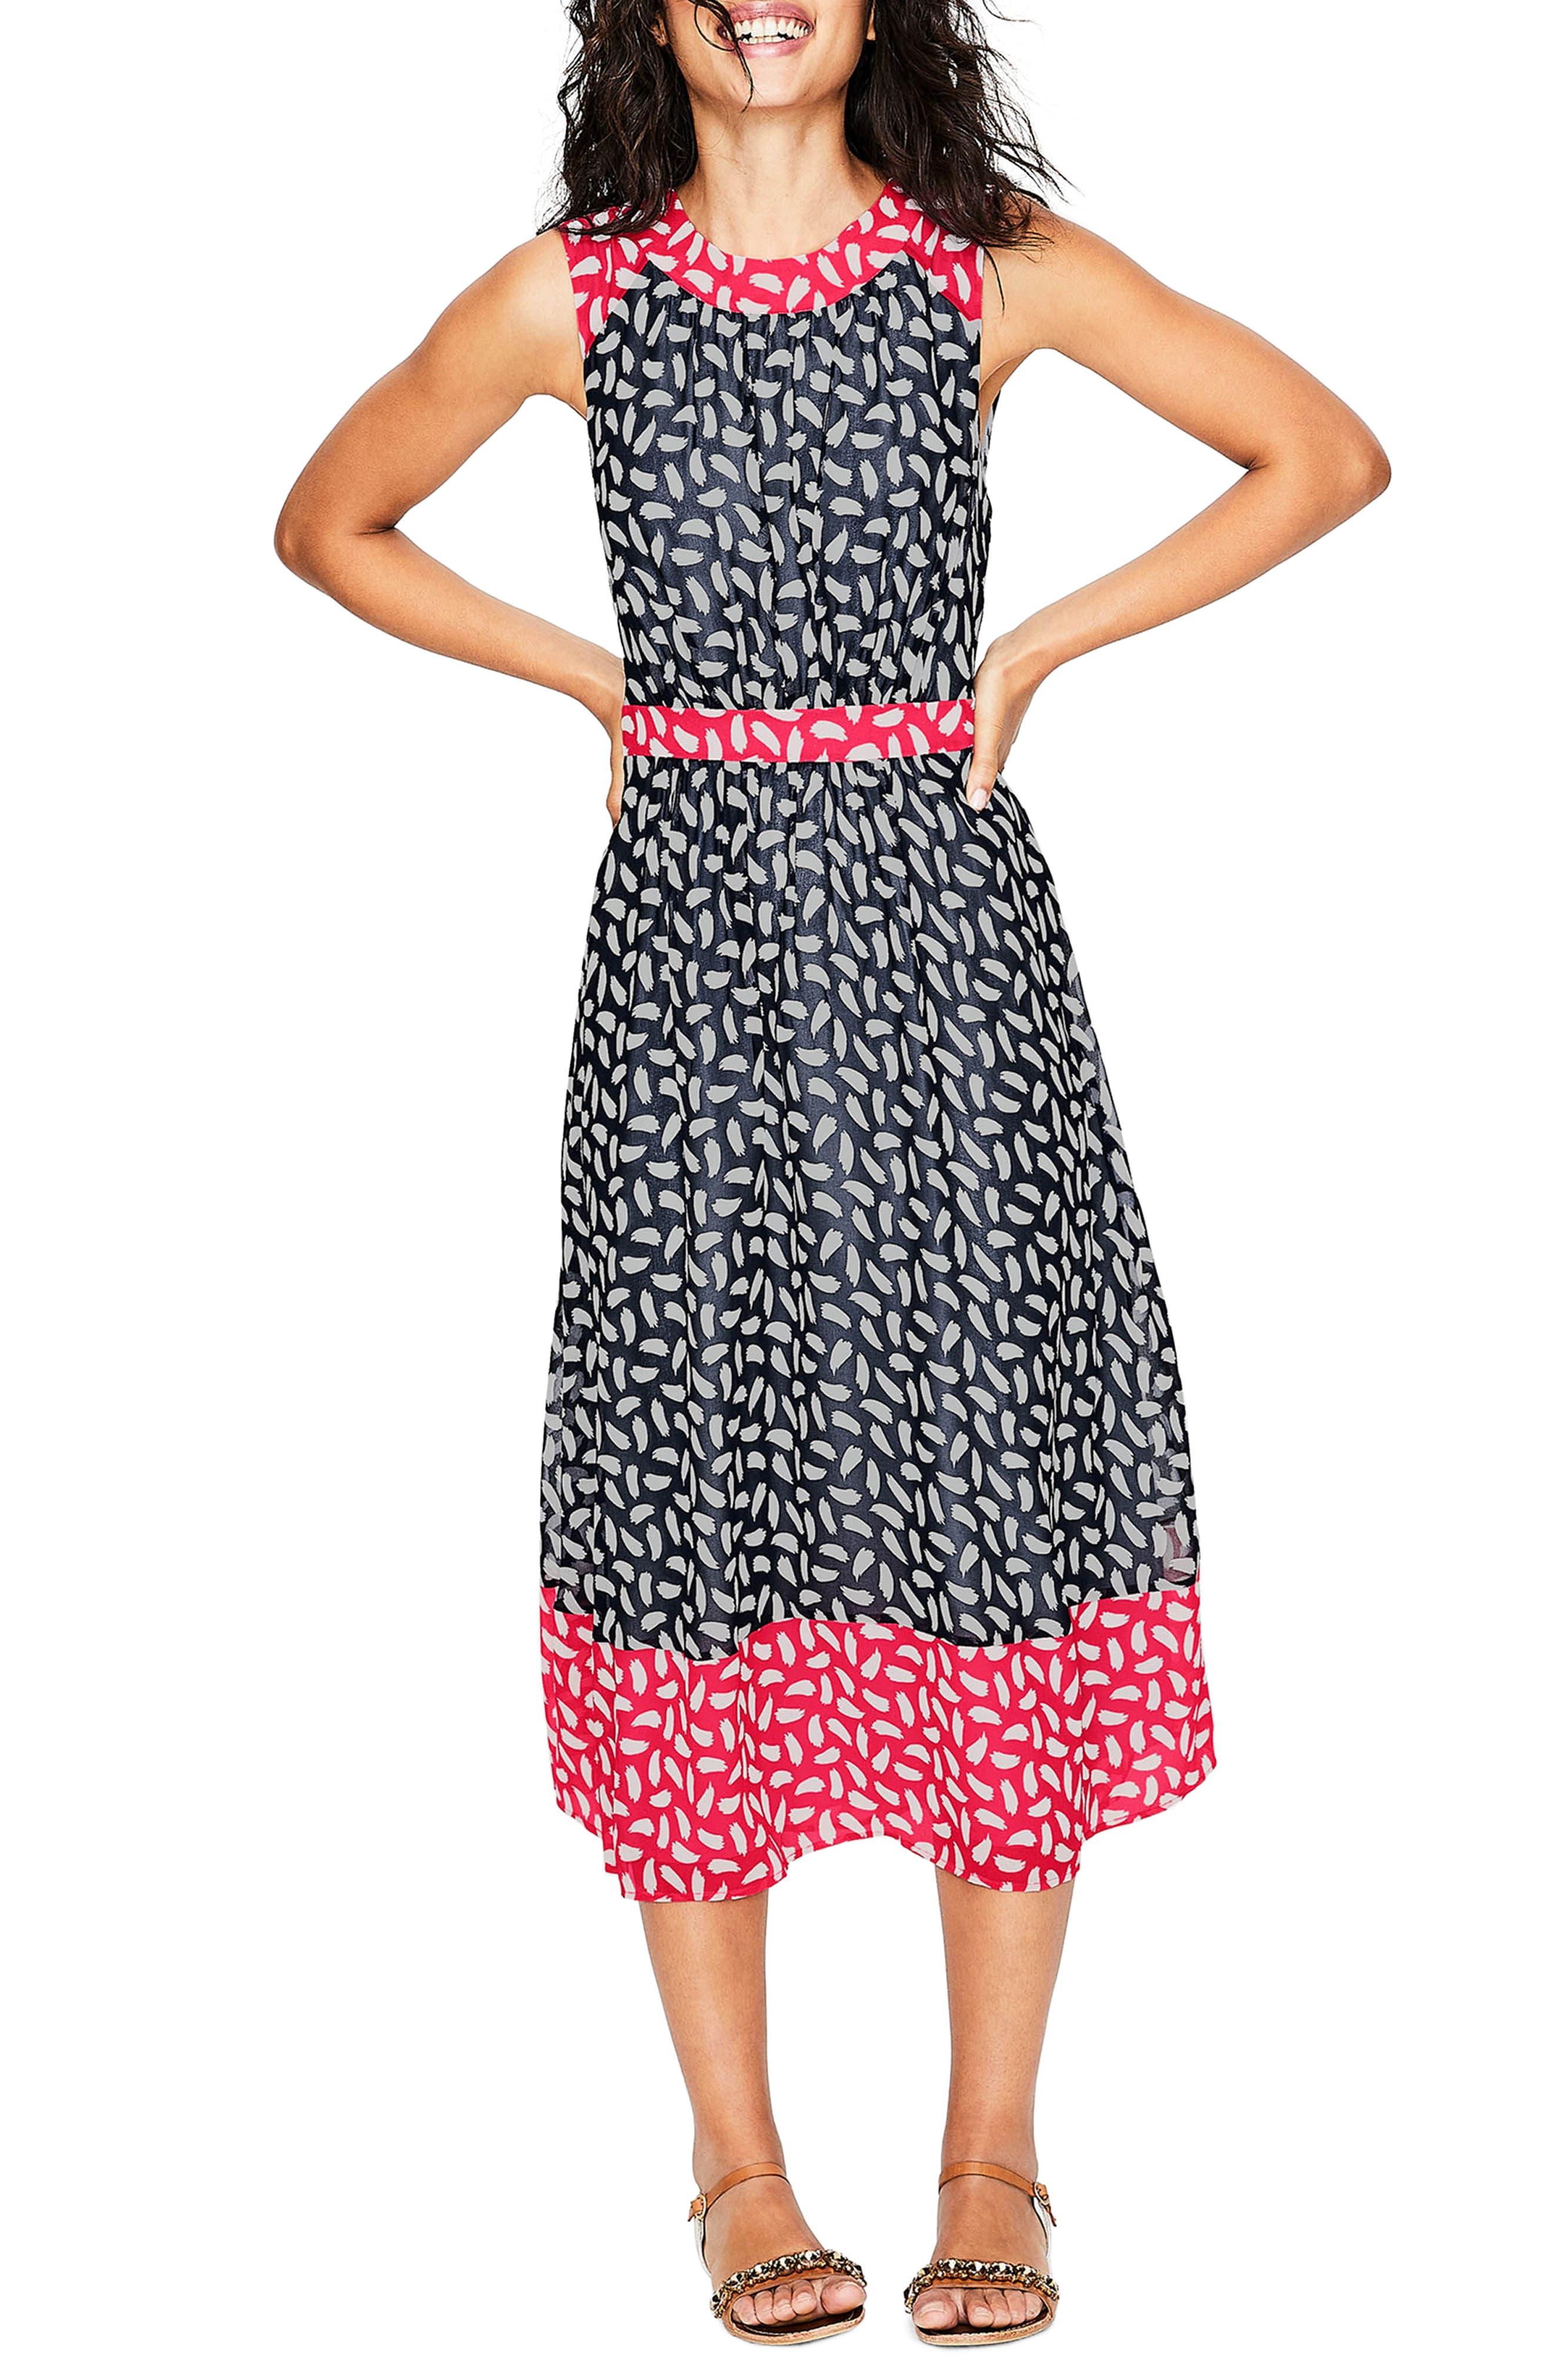 BODEN Sylvie Print Sleeveless Dress, Main, color, 414